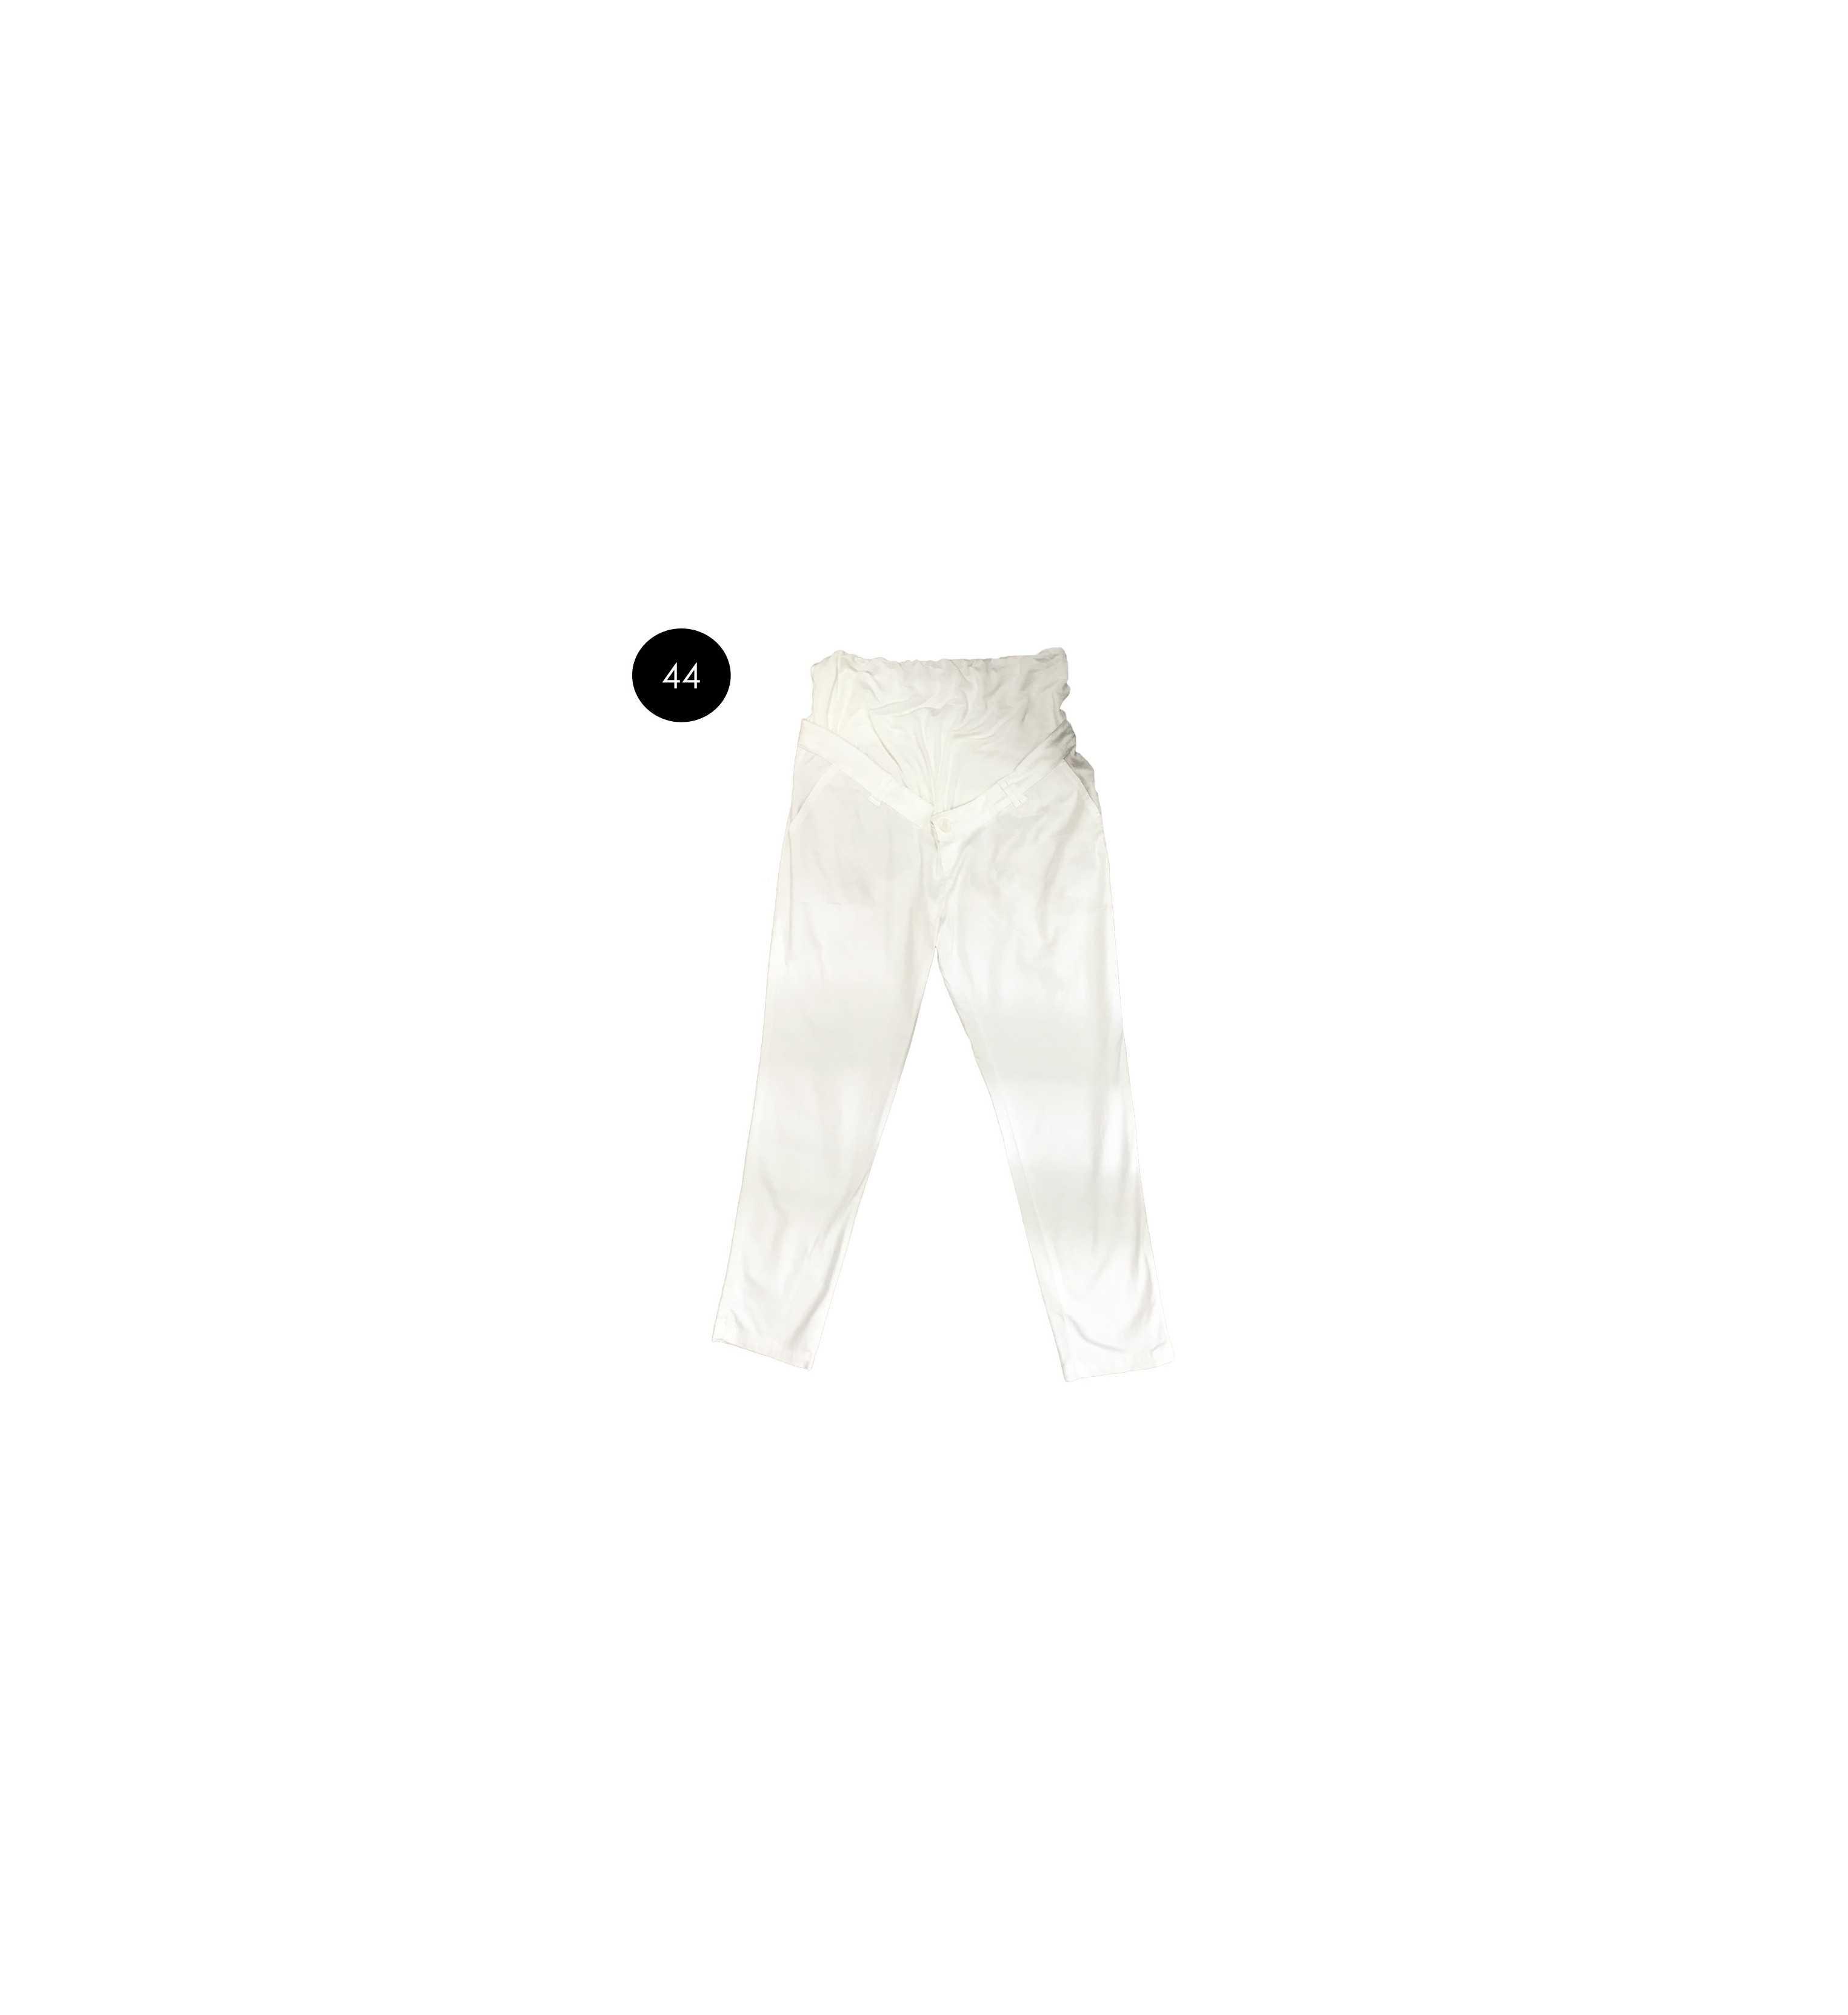 Pantalon grossesse blanc en coton sergé